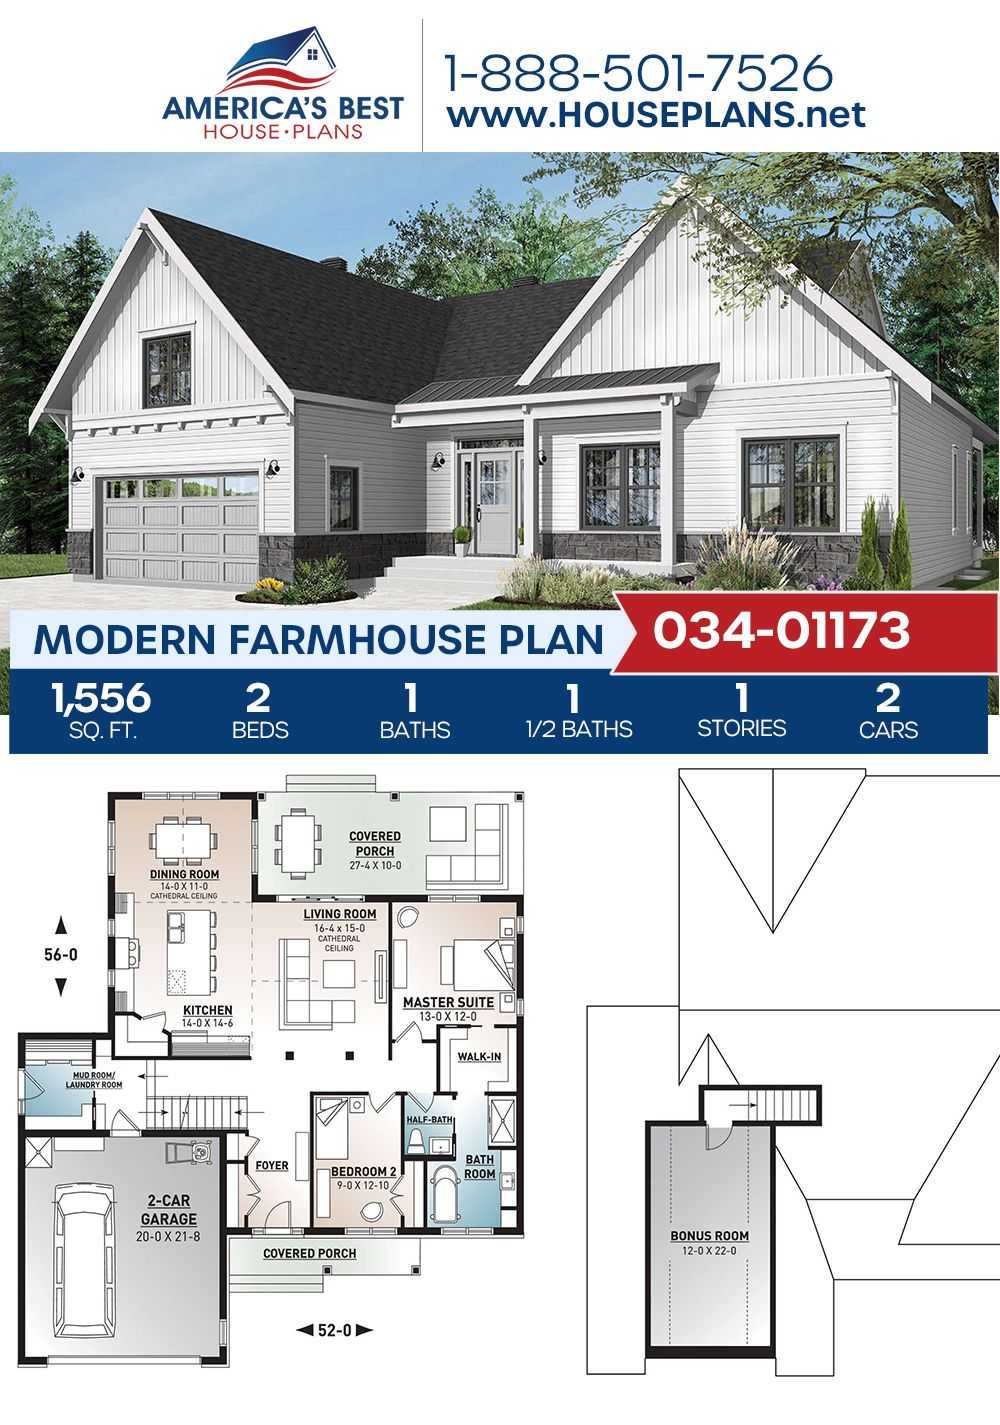 House Plan 034 01173 Modern Farmhouse Plan 1 556 Square Feet 2 Bedrooms 1 5 Bathrooms Modern Farmhouse Plans Small House Exteriors Farmhouse Plans